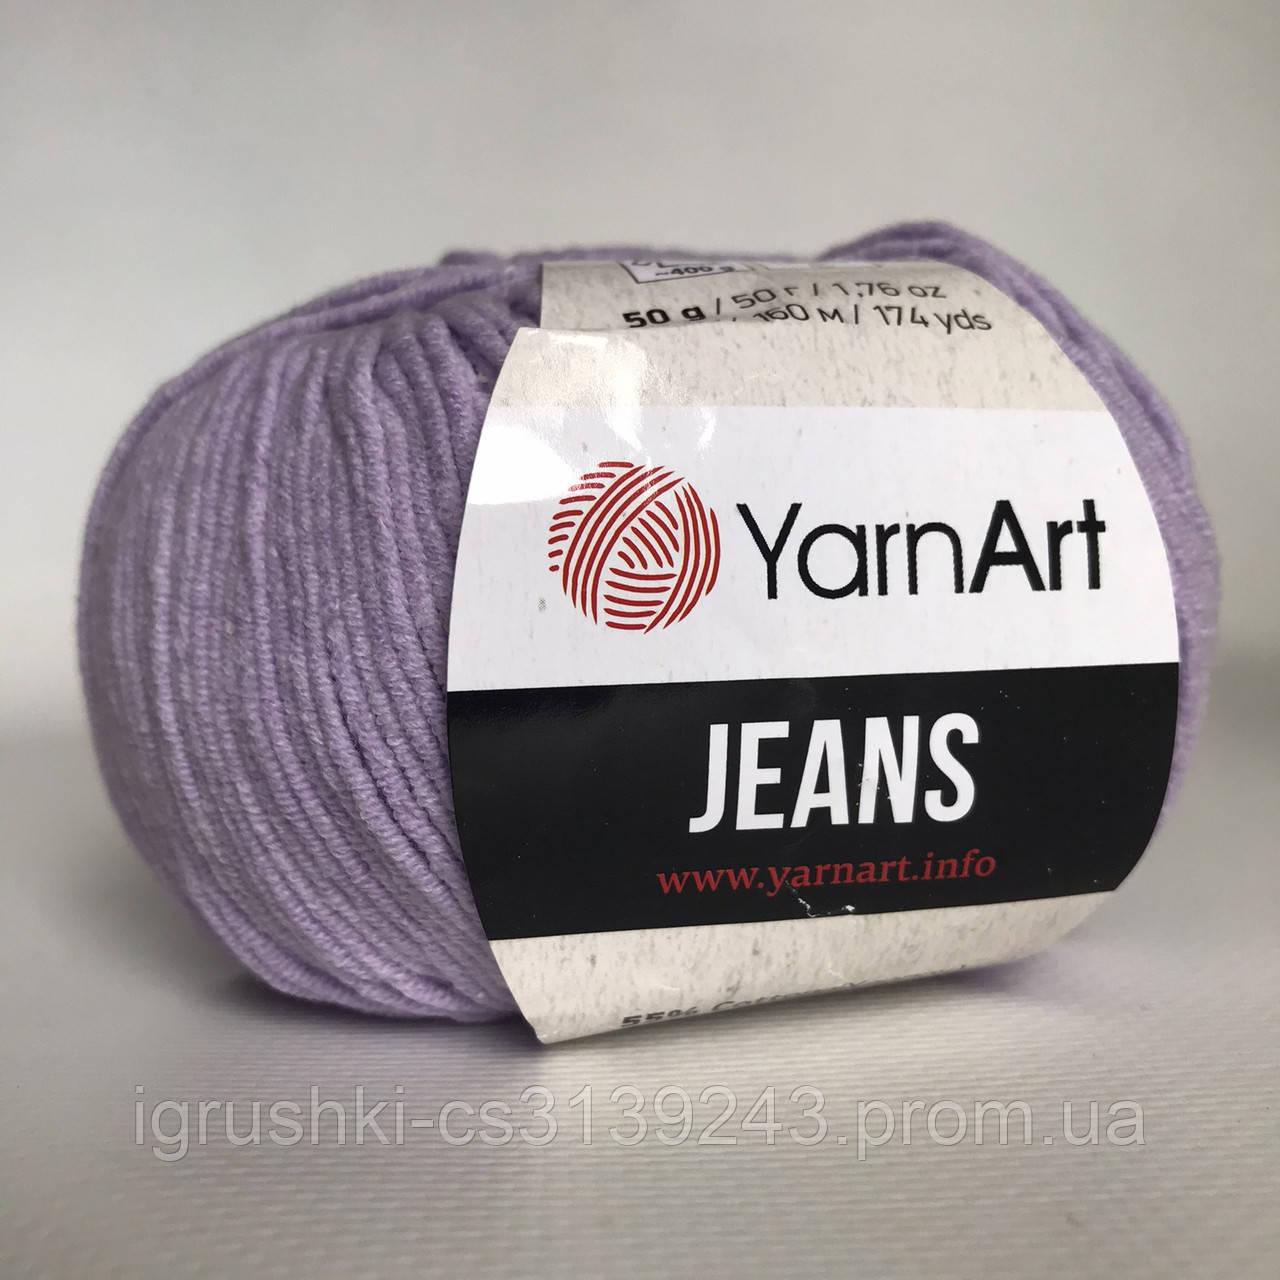 YarnArt Jeans (ярнарт джинс) 89 Светло-сиреневый